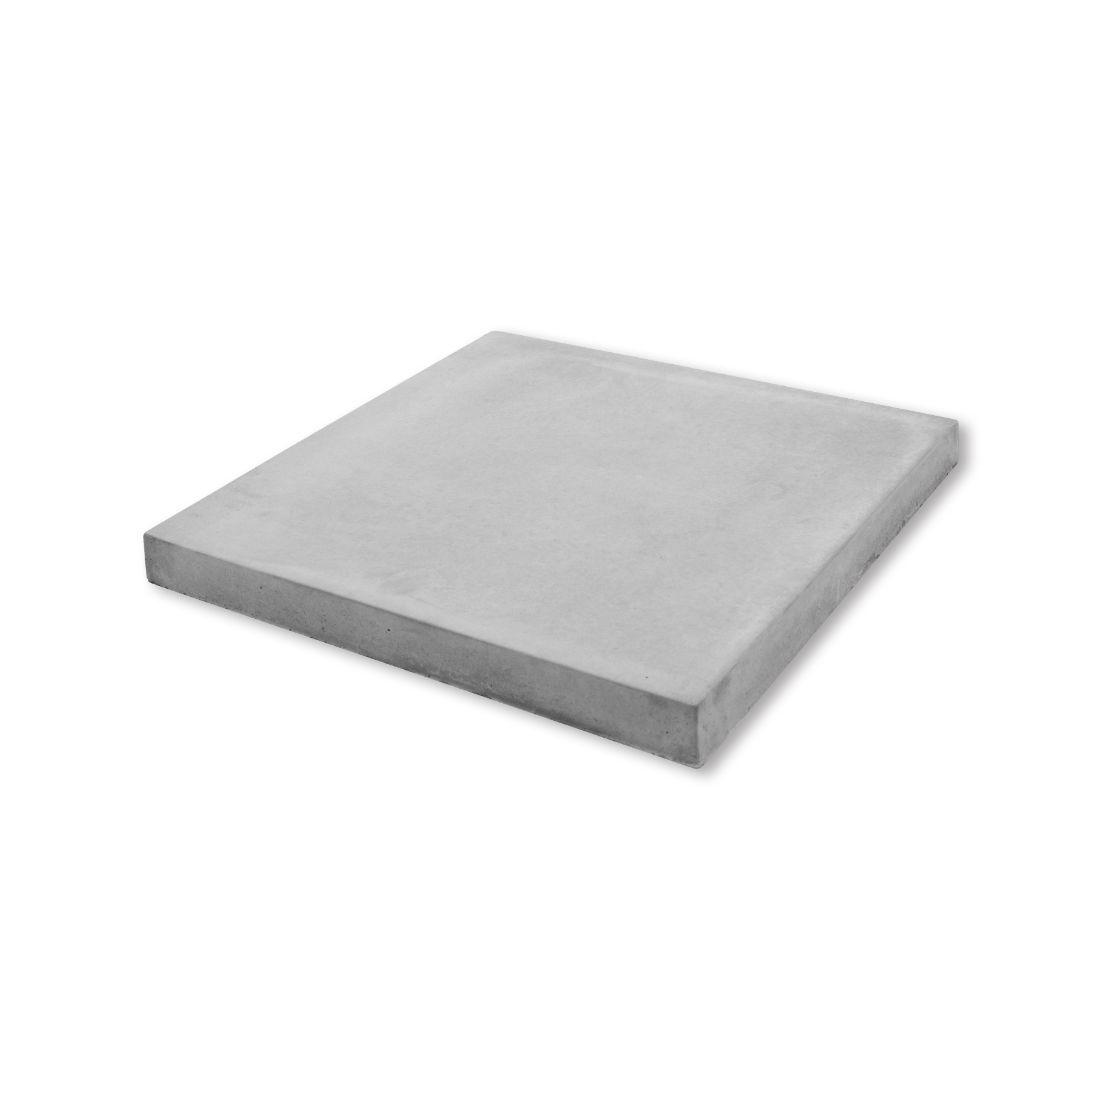 Milano Concrete Paver 450 x 450 x 37mm Natural Stone